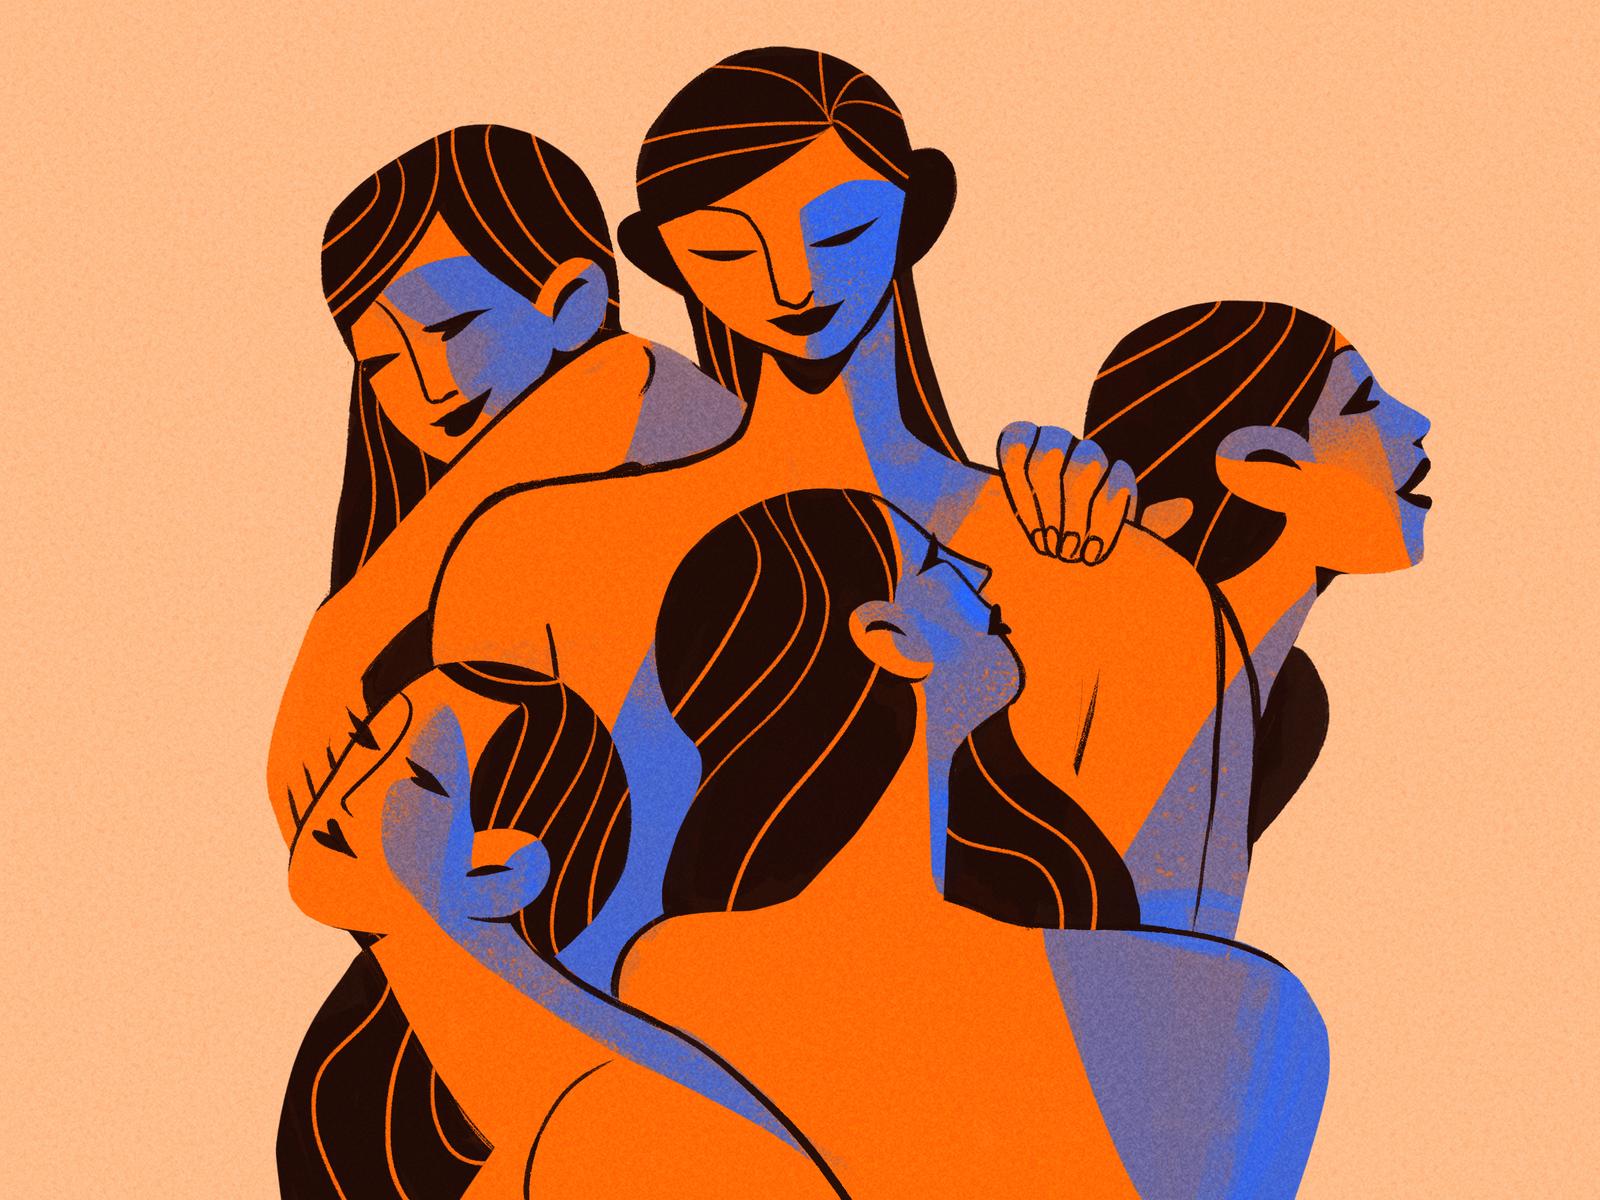 Lovely Illustrations of the Month — September 2018 – Collect UI Design, UI / UX Inspiration Blog